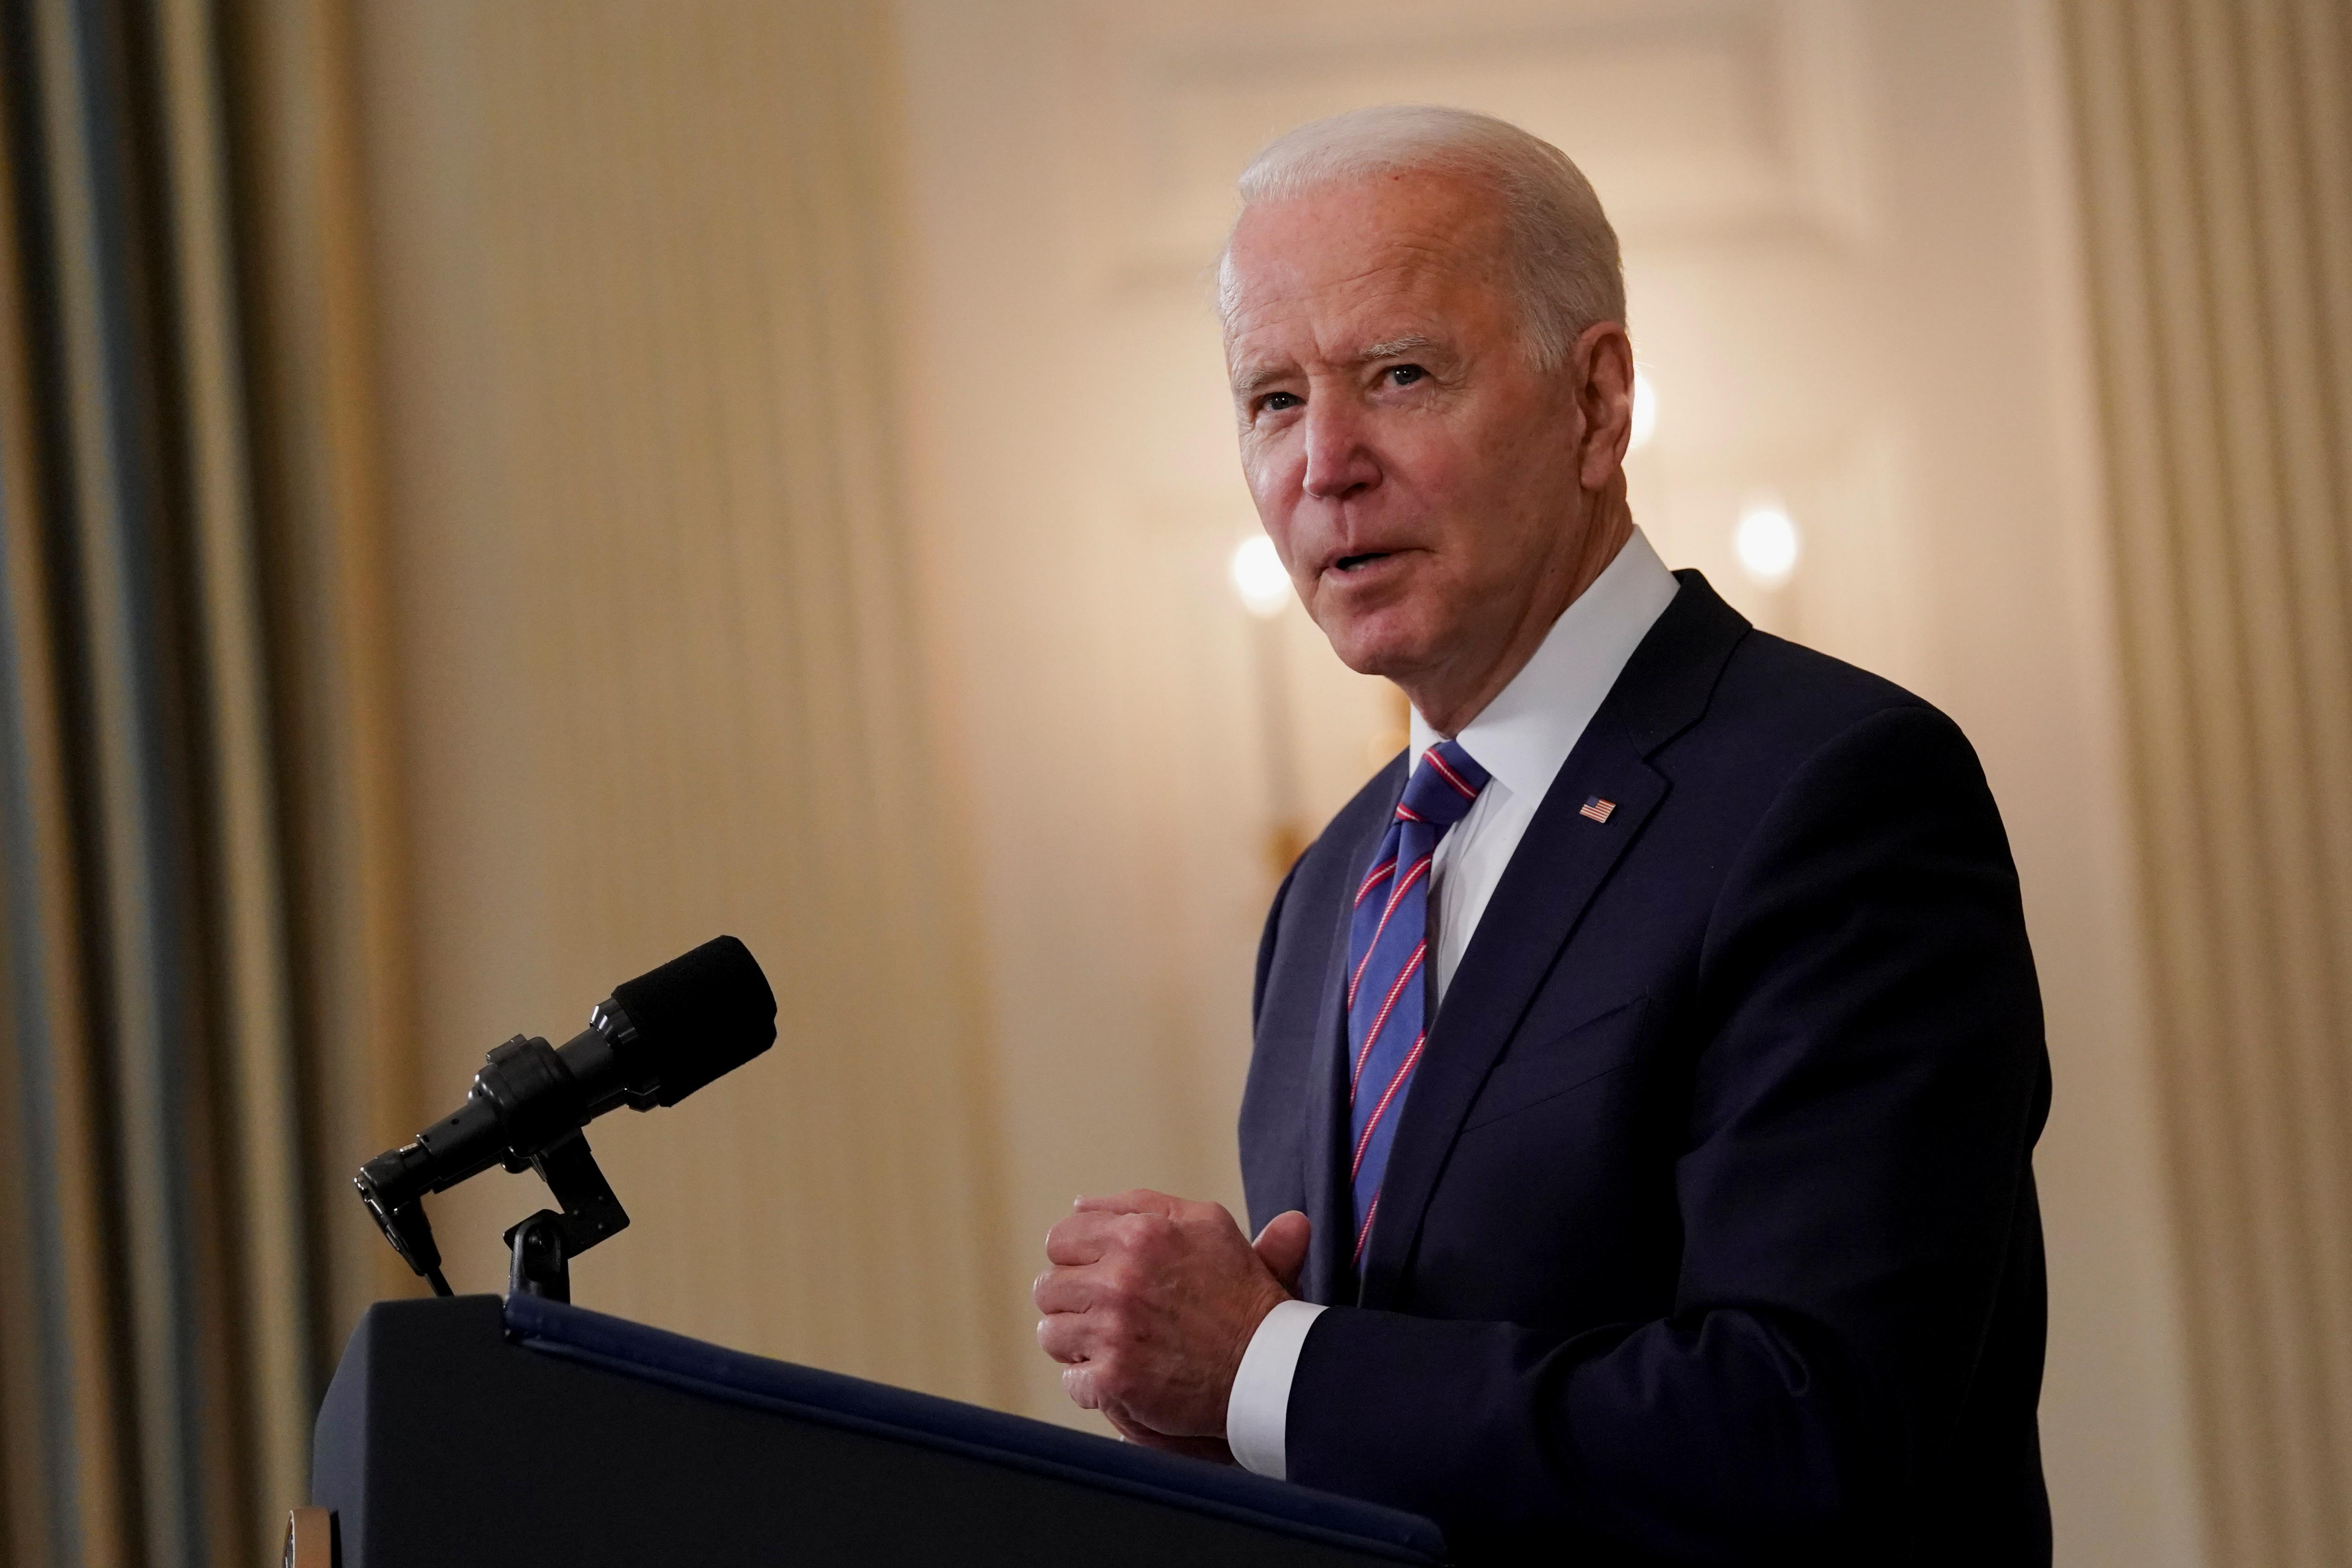 U.S. President Joe Biden delivers remarks on the Department of Labor